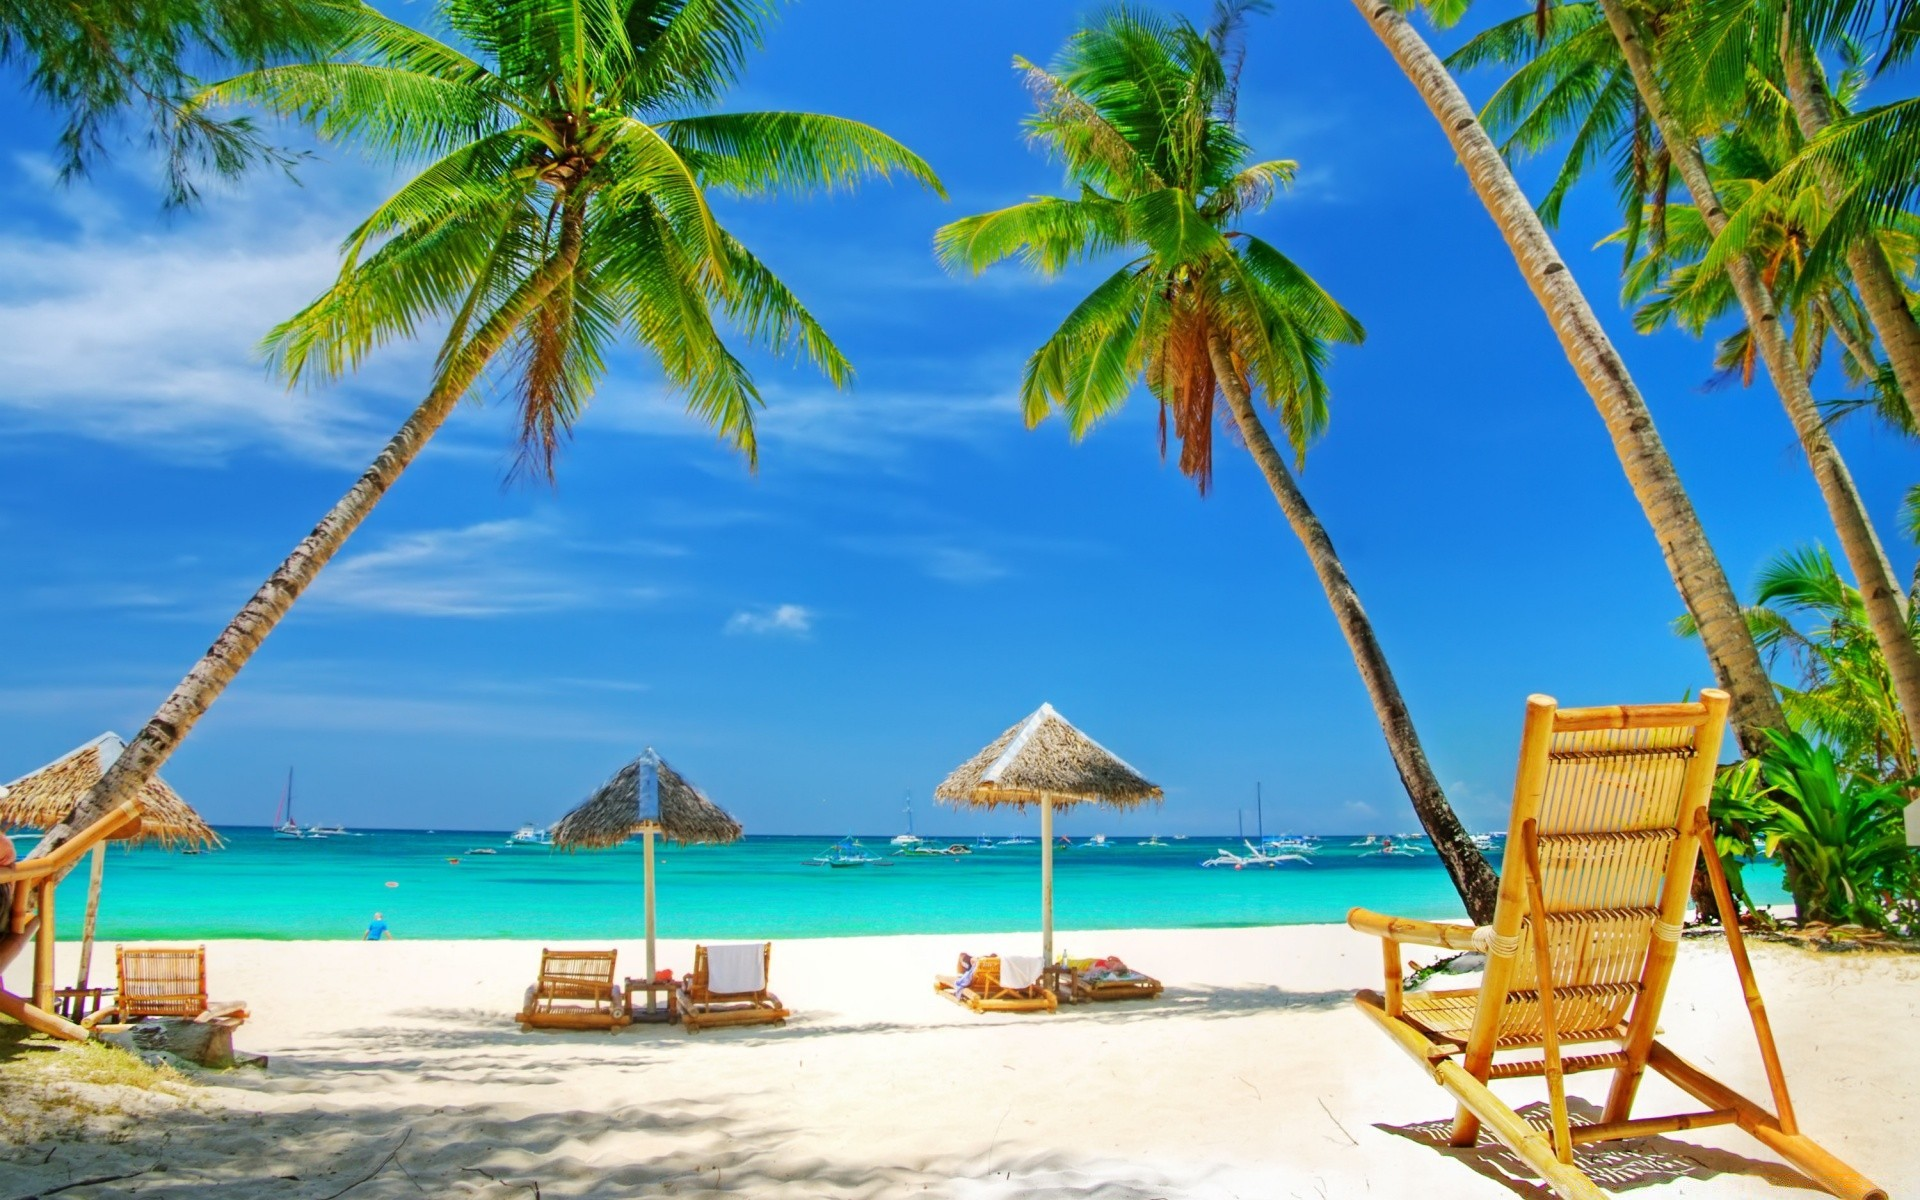 Rather valuable tropical beach desktop think, that